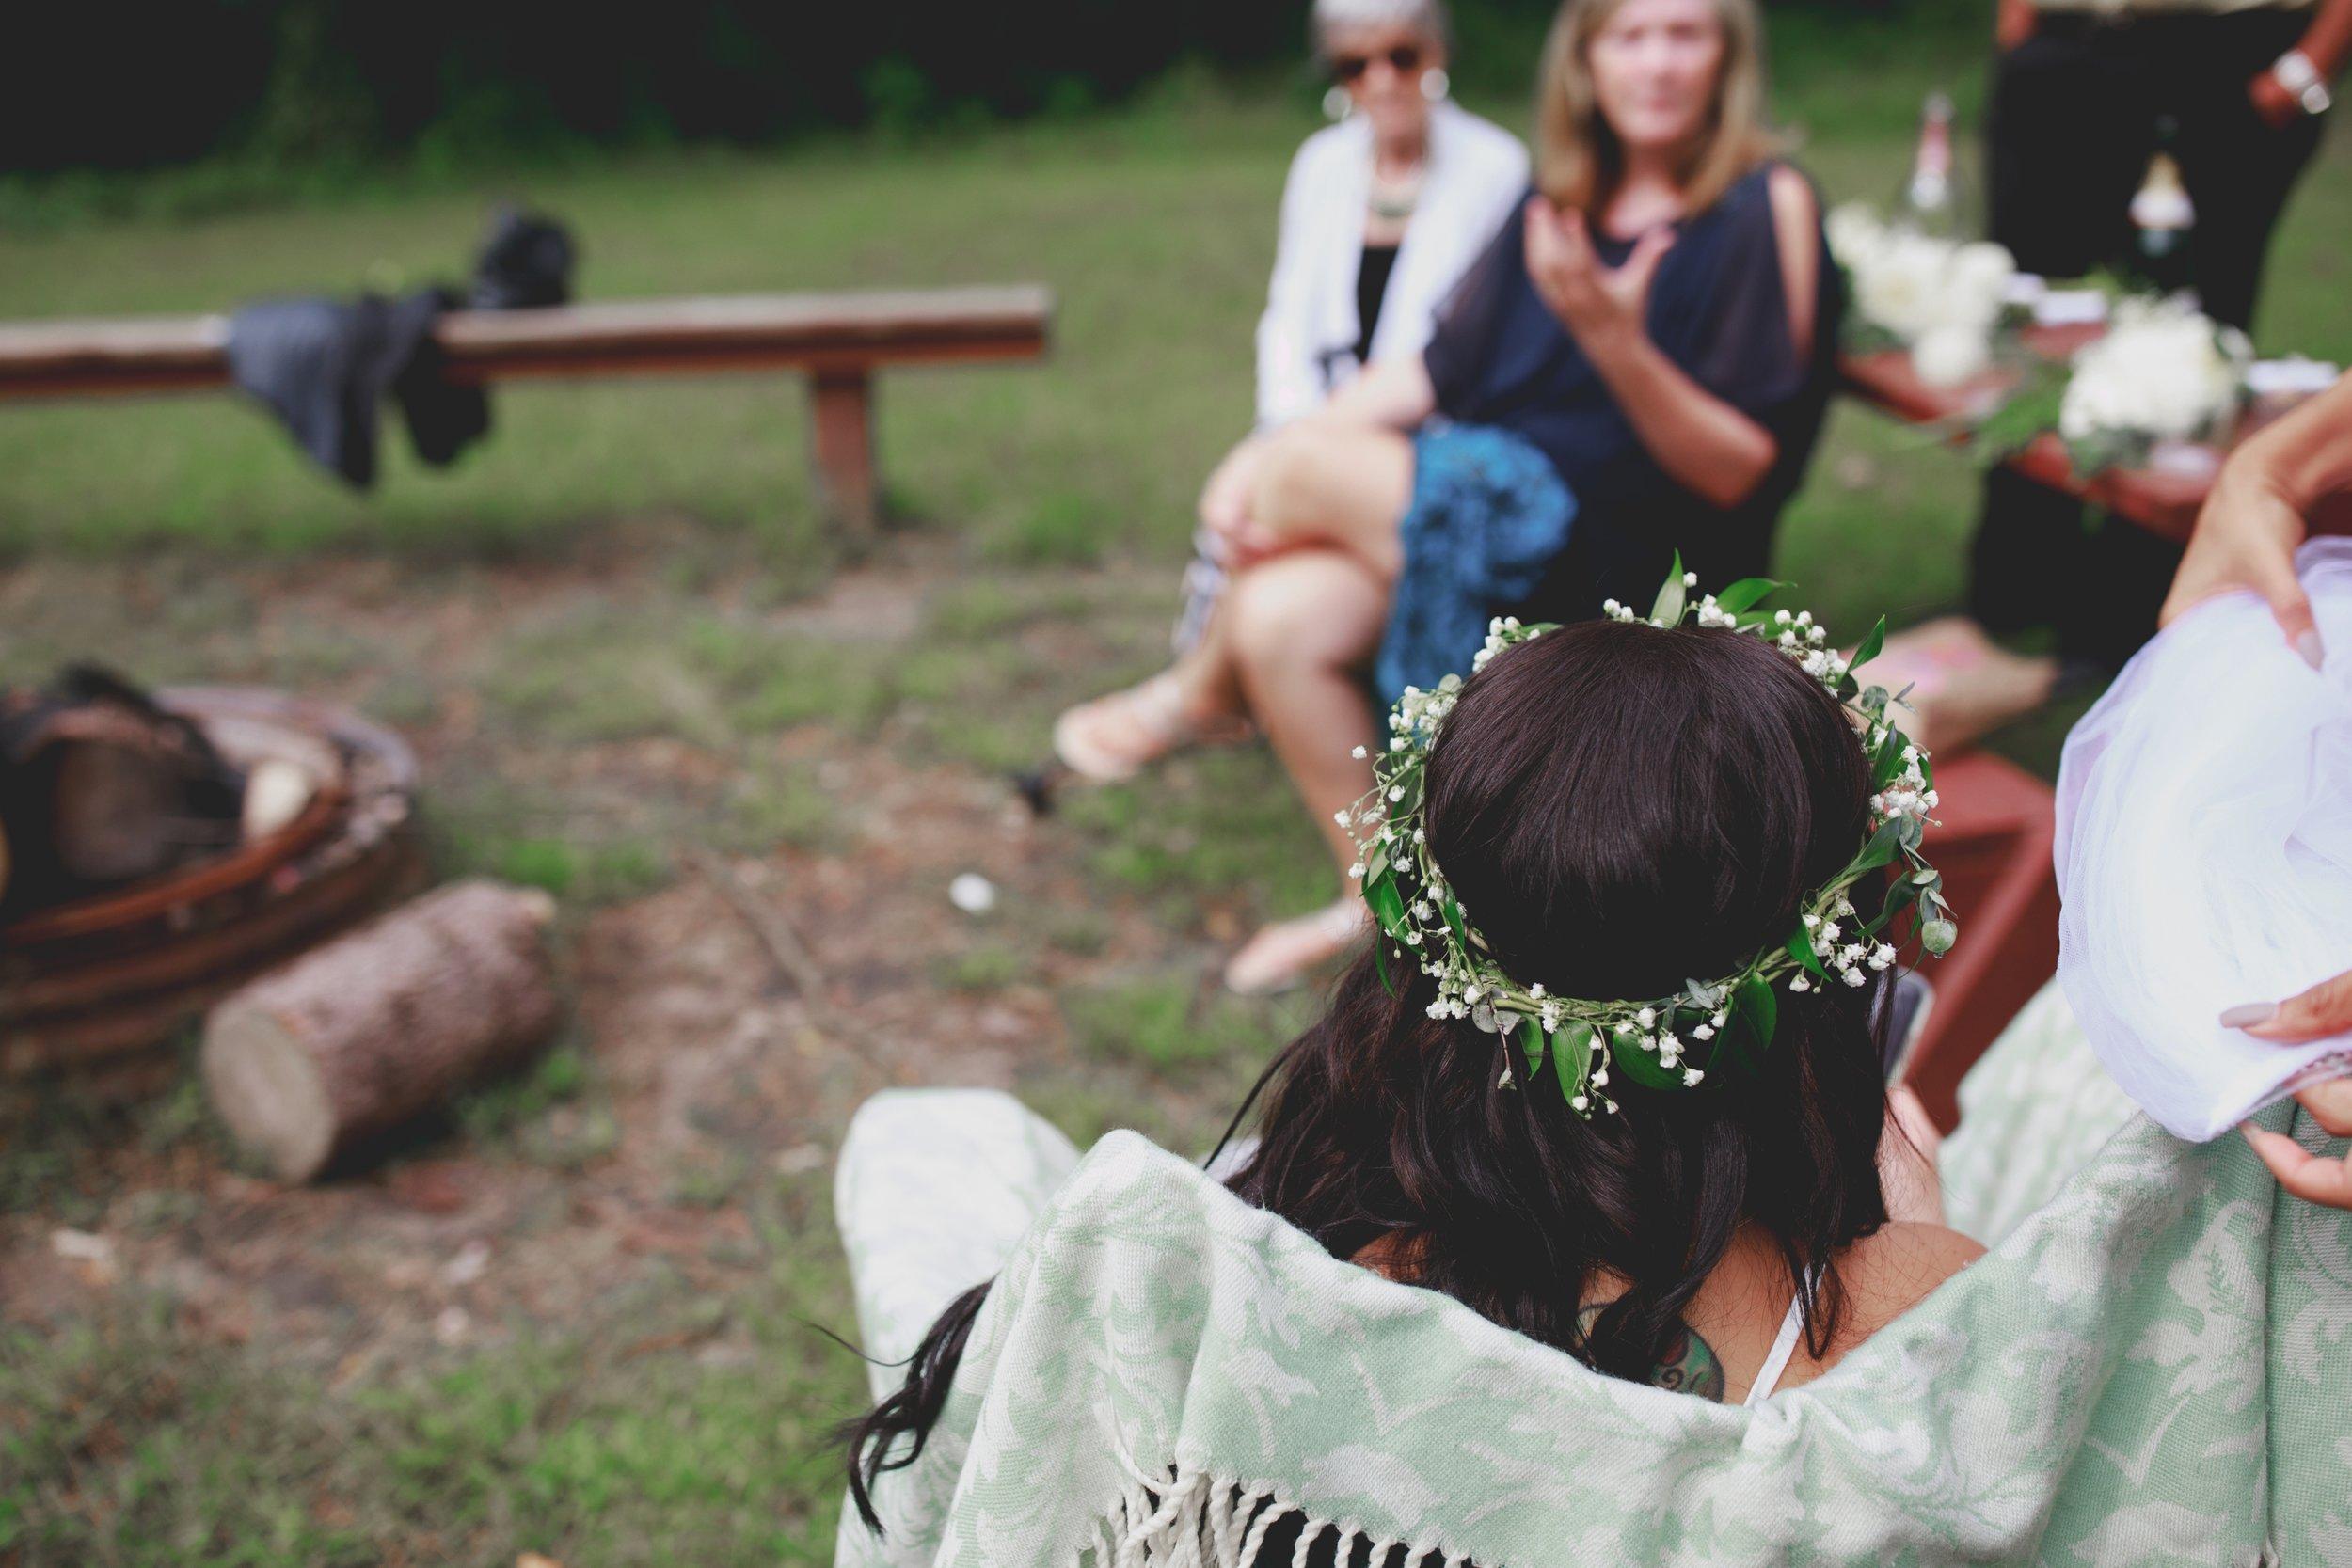 amanda_vanvels_michigan_camp_wedding_063.jpg